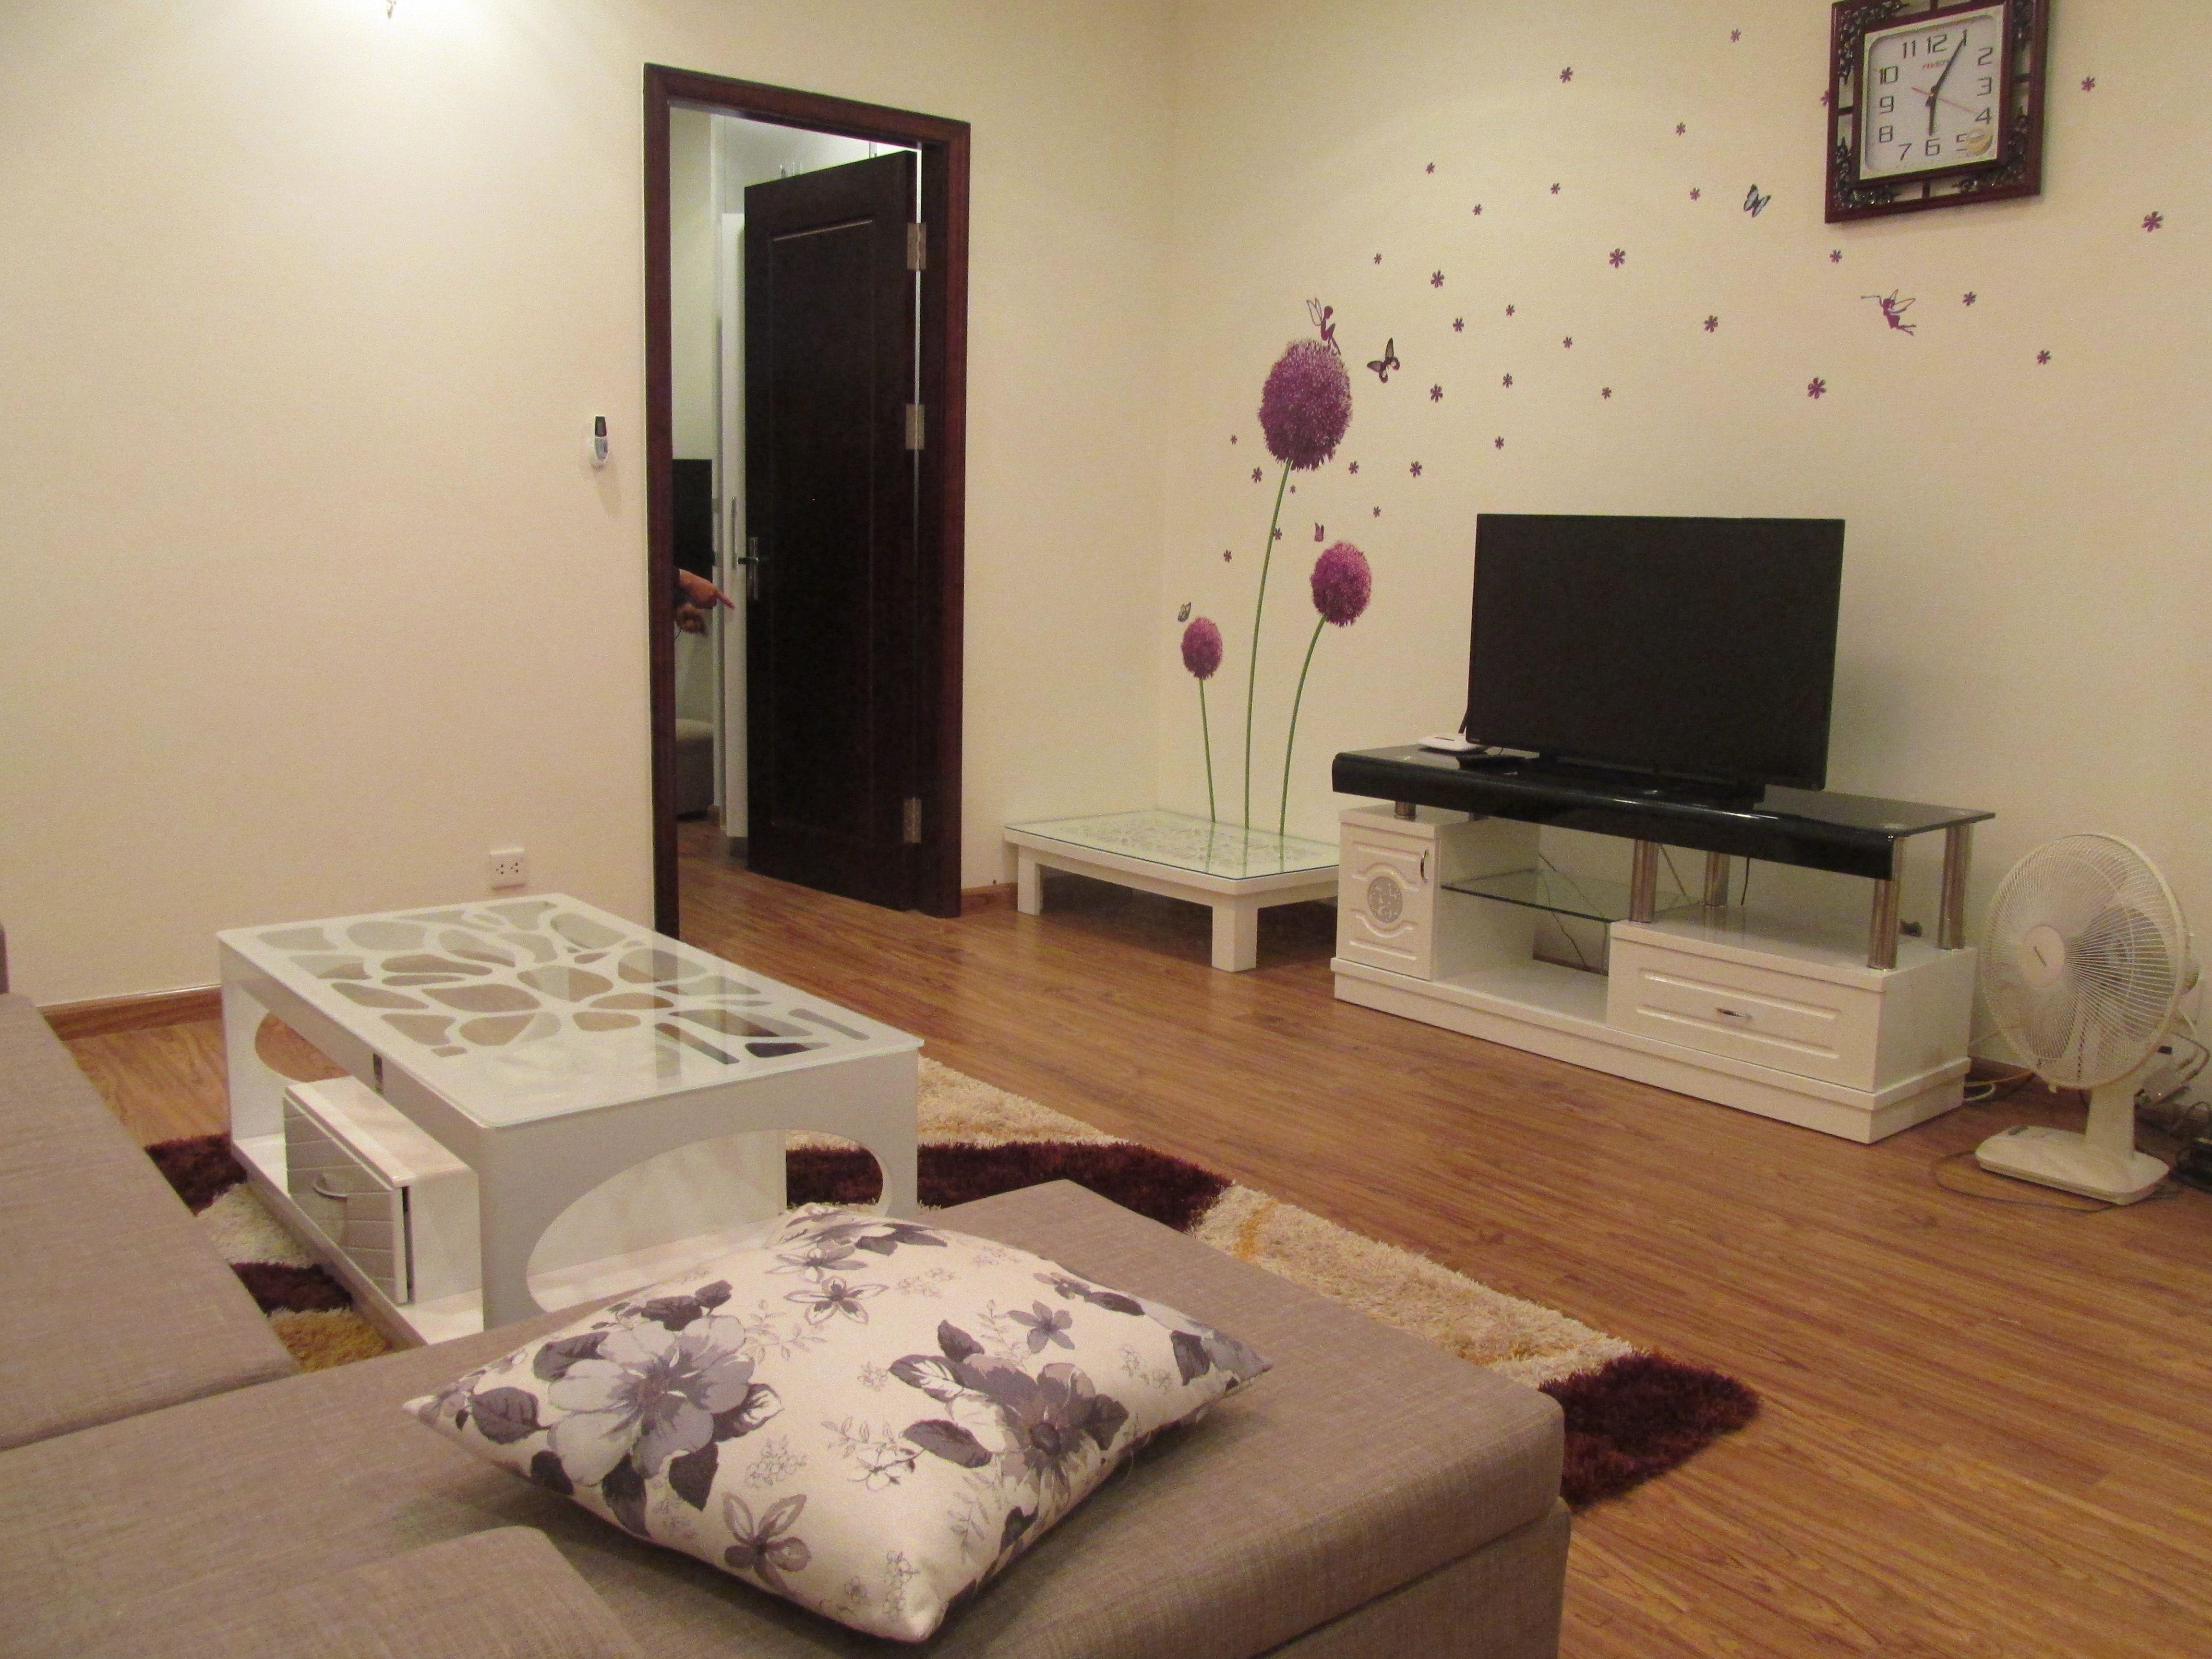 One Bedroom Townhomes For Rent Pilotschoolbanyuwangi Phoenix Xfmshp Homes